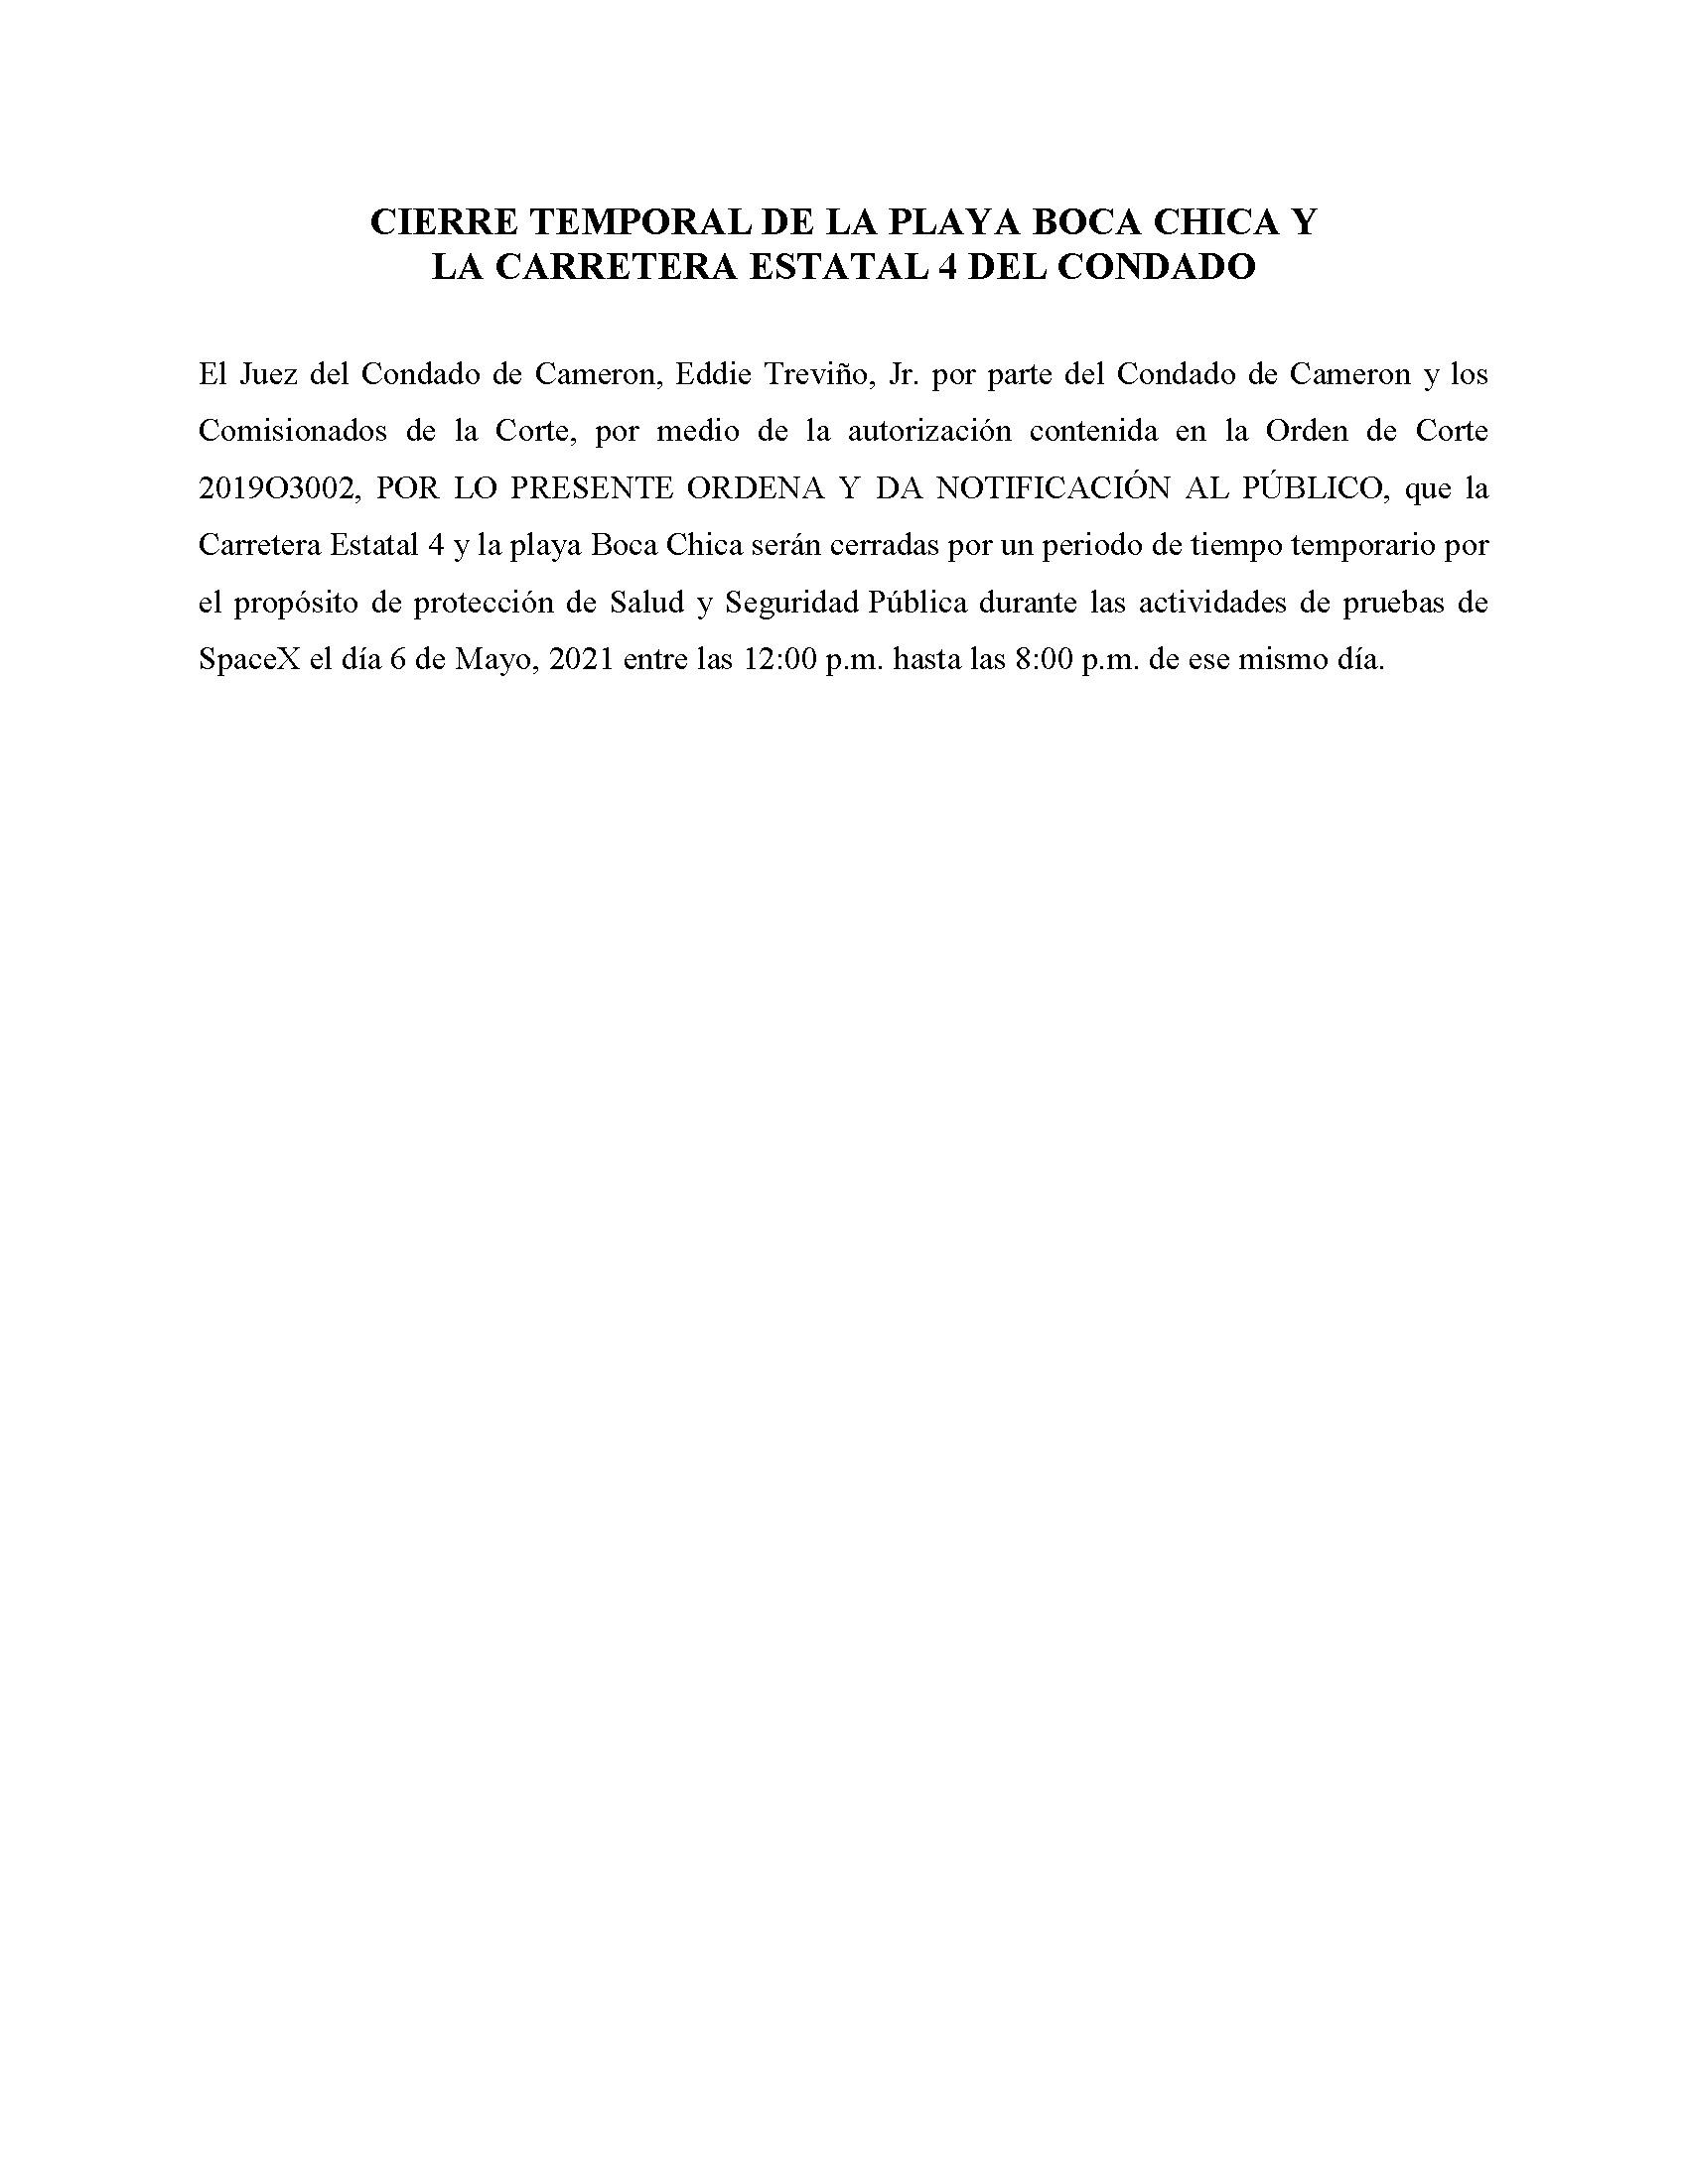 ORDER.CLOSURE OF HIGHWAY 4 Y LA PLAYA BOCA CHICA.SPANISH.05.06.2021